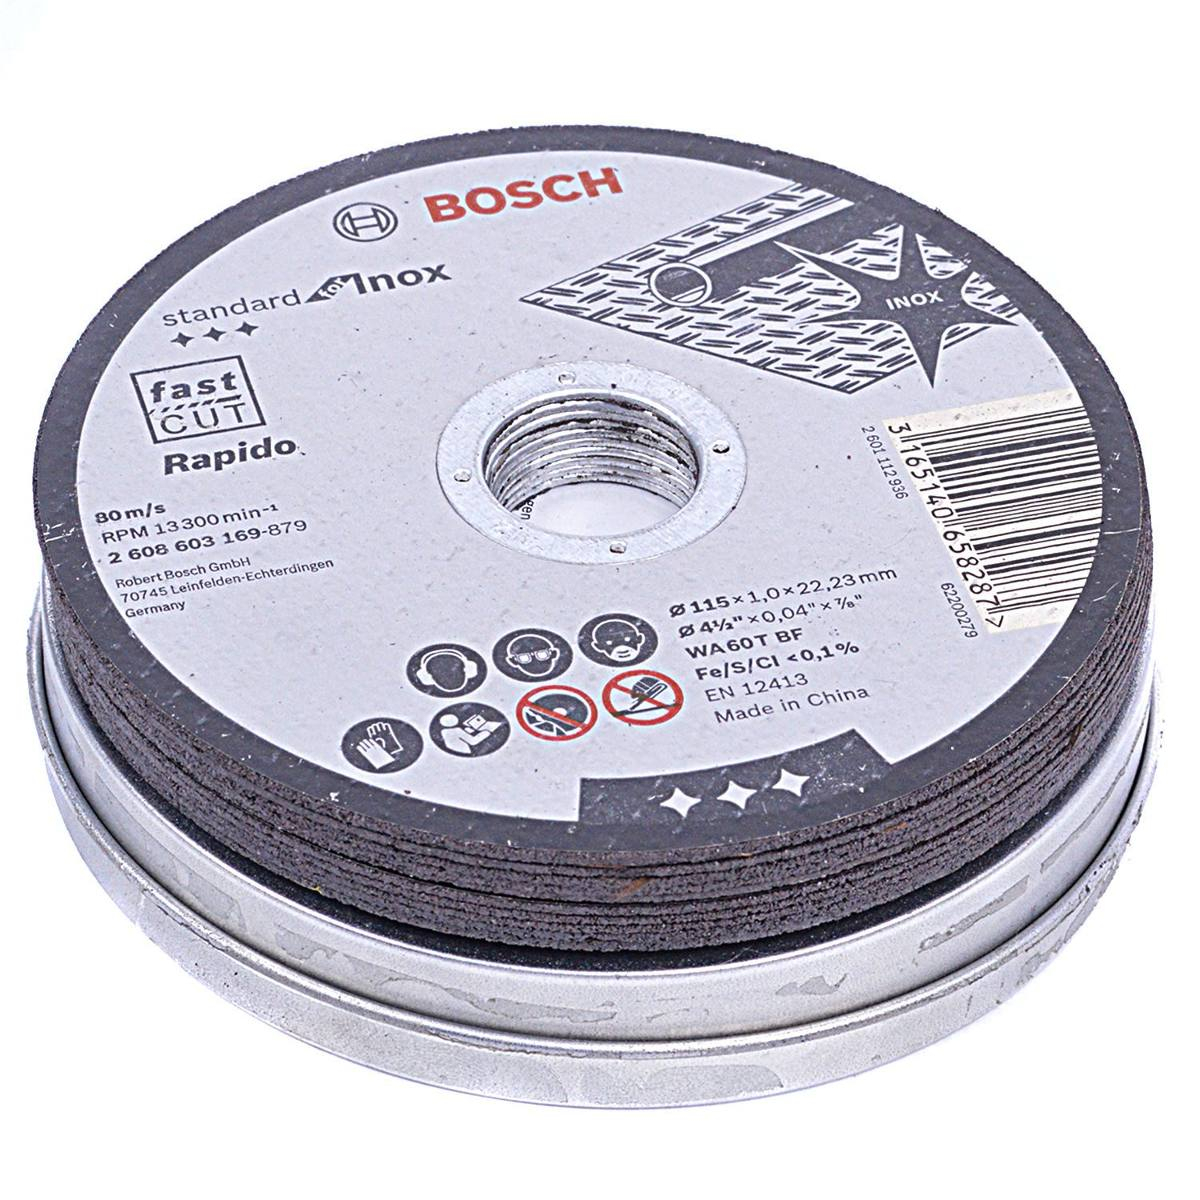 SET 10 DISCOS C.METAL BOSCH 115*1 LATA  603254